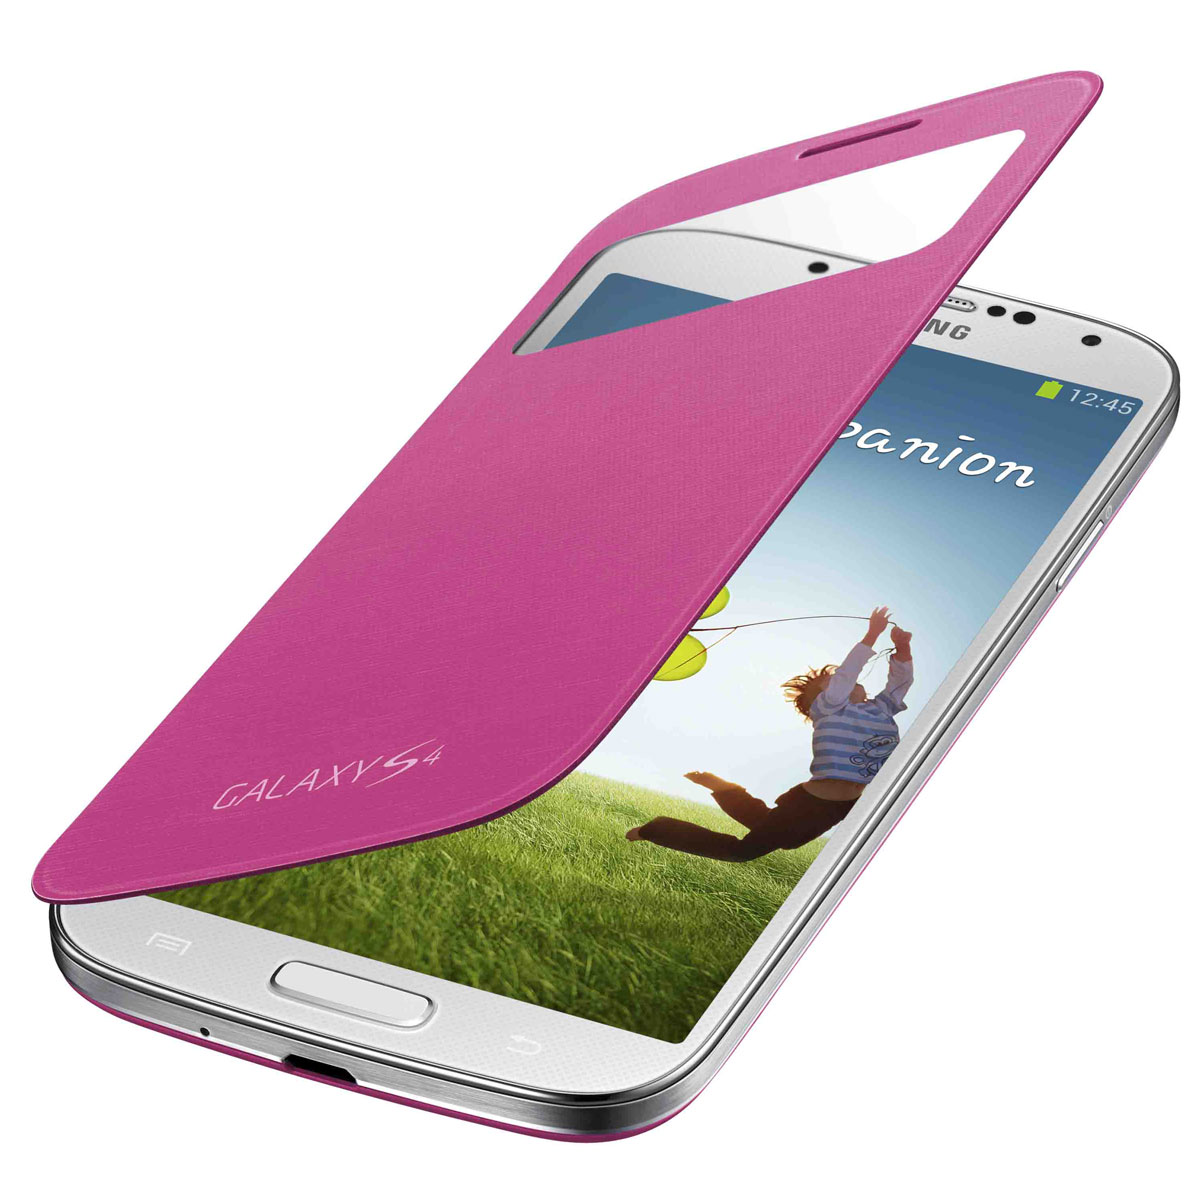 Etui téléphone Samsung S-View Rose Samsung Galaxy S4 Etui folio pour Samsung Galaxy S4 GT-i9500/9505